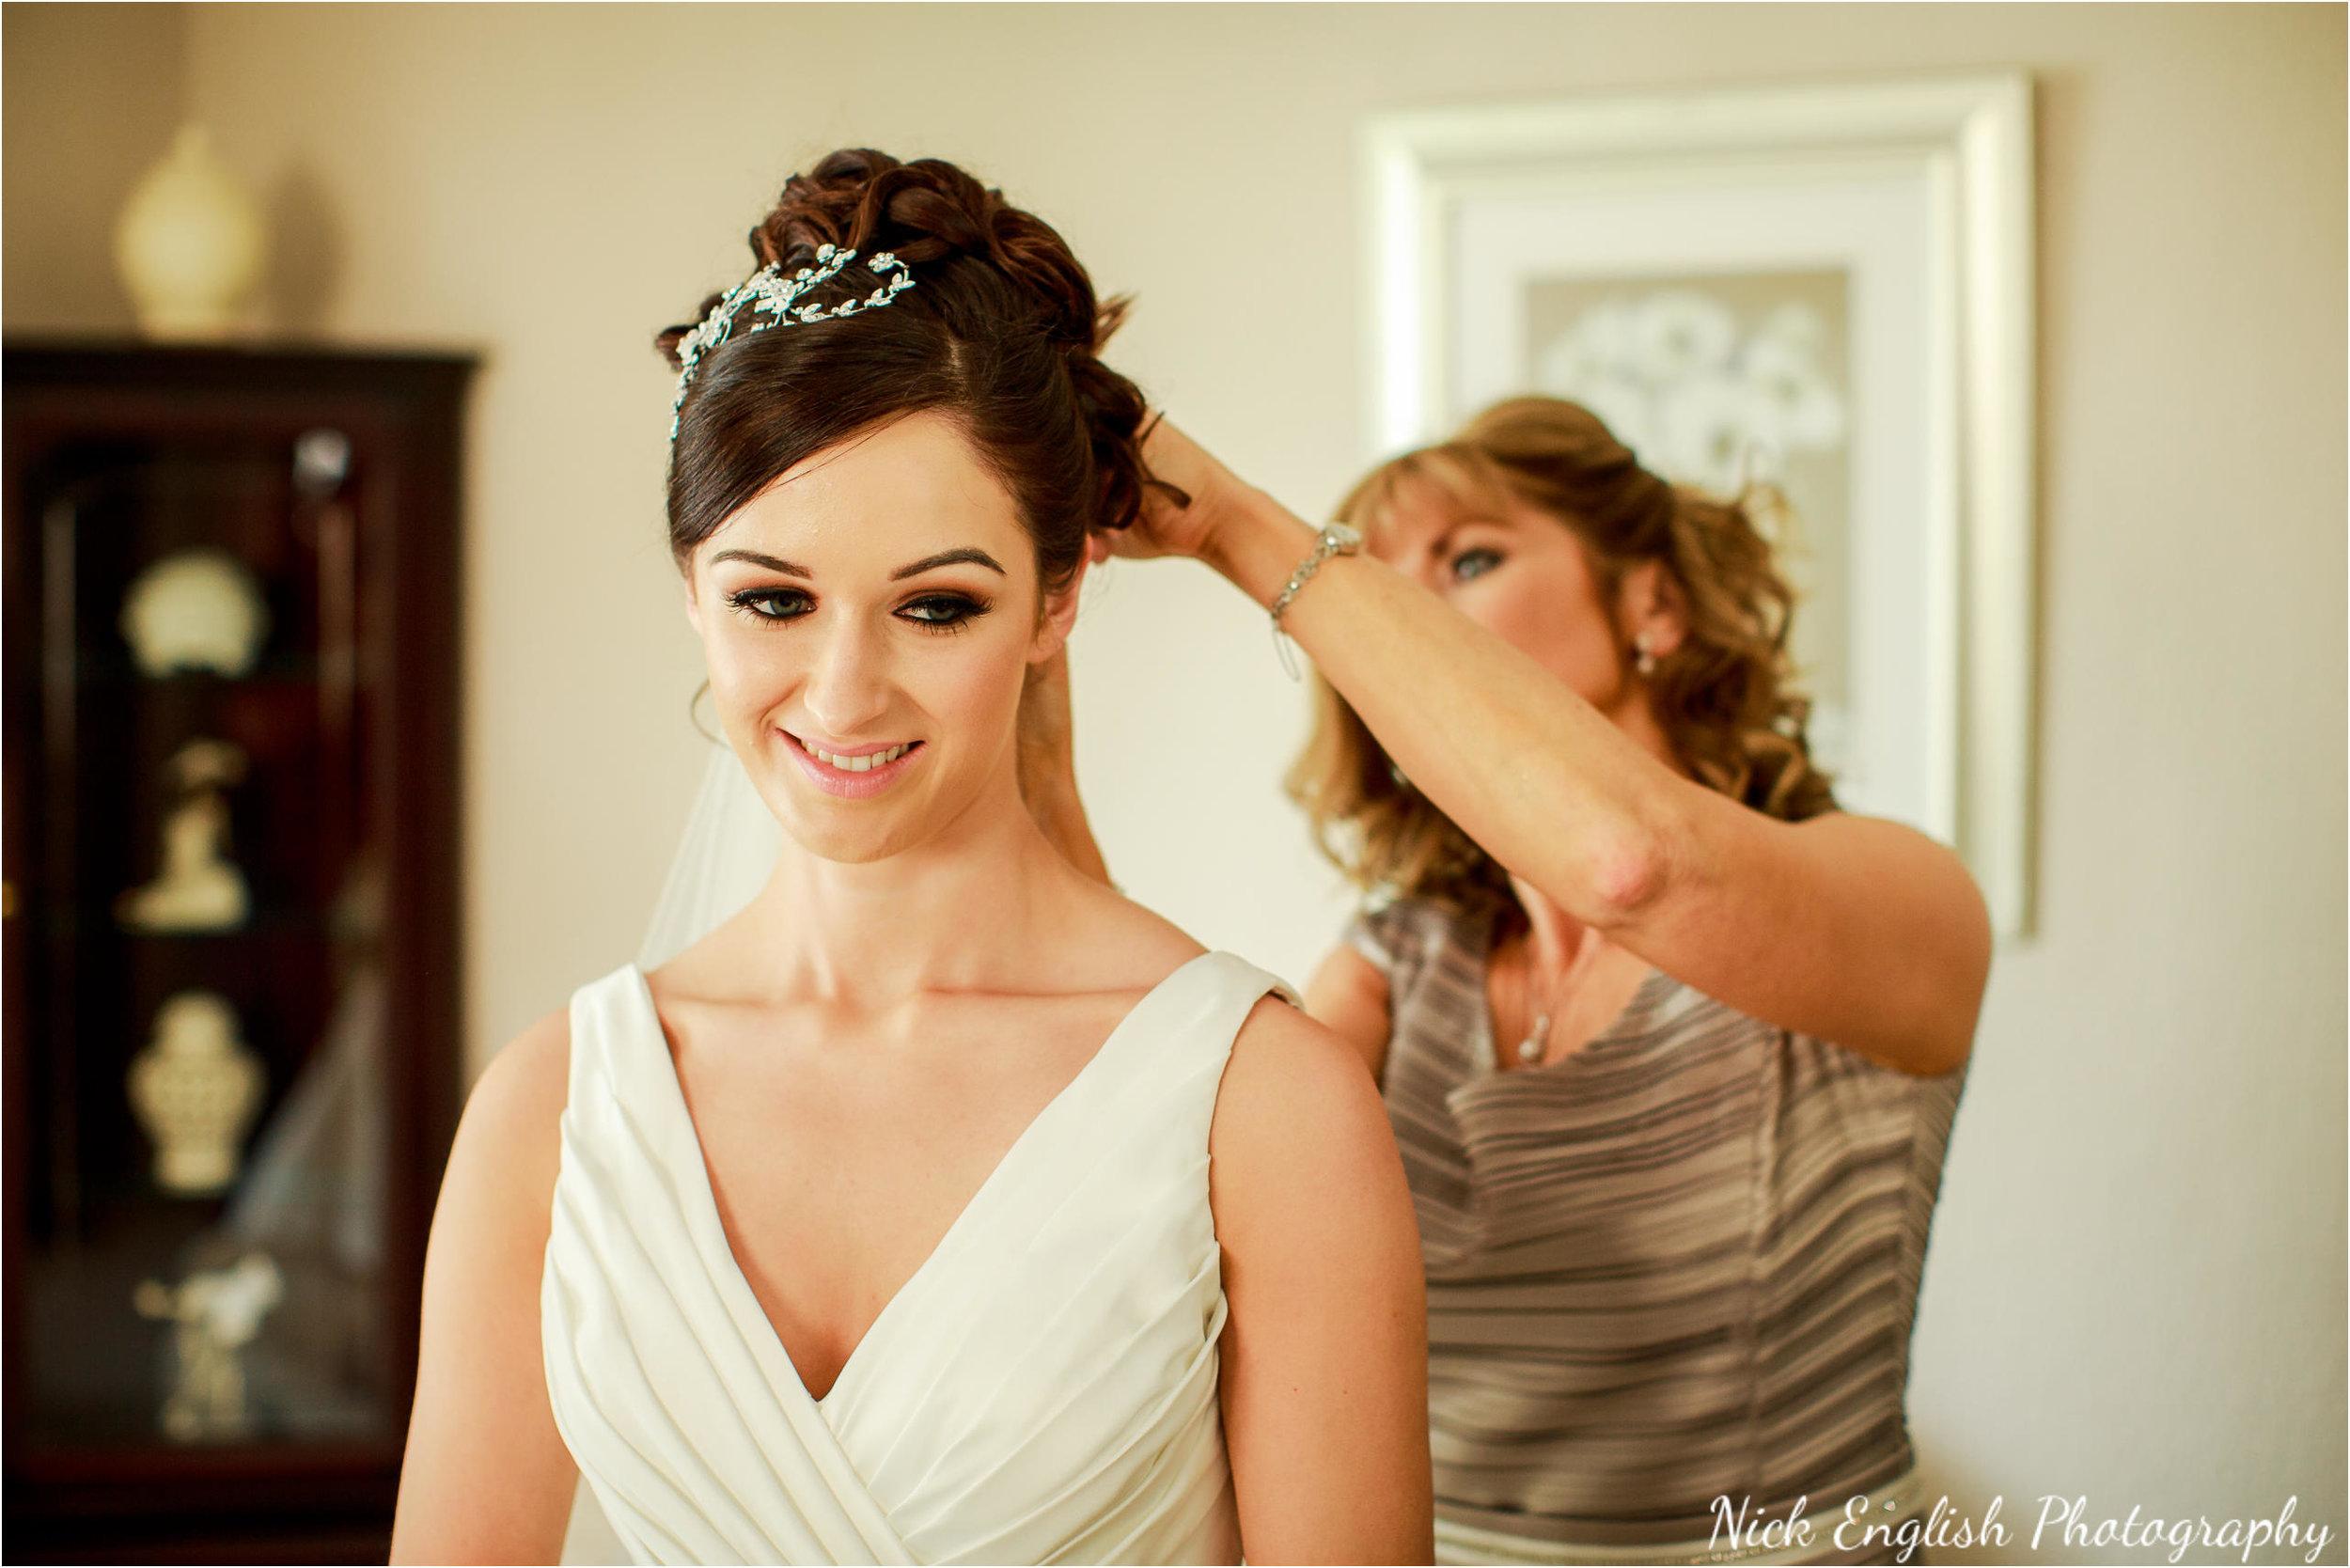 Emily David Wedding Photographs at Barton Grange Preston by Nick English Photography 36jpg.jpeg